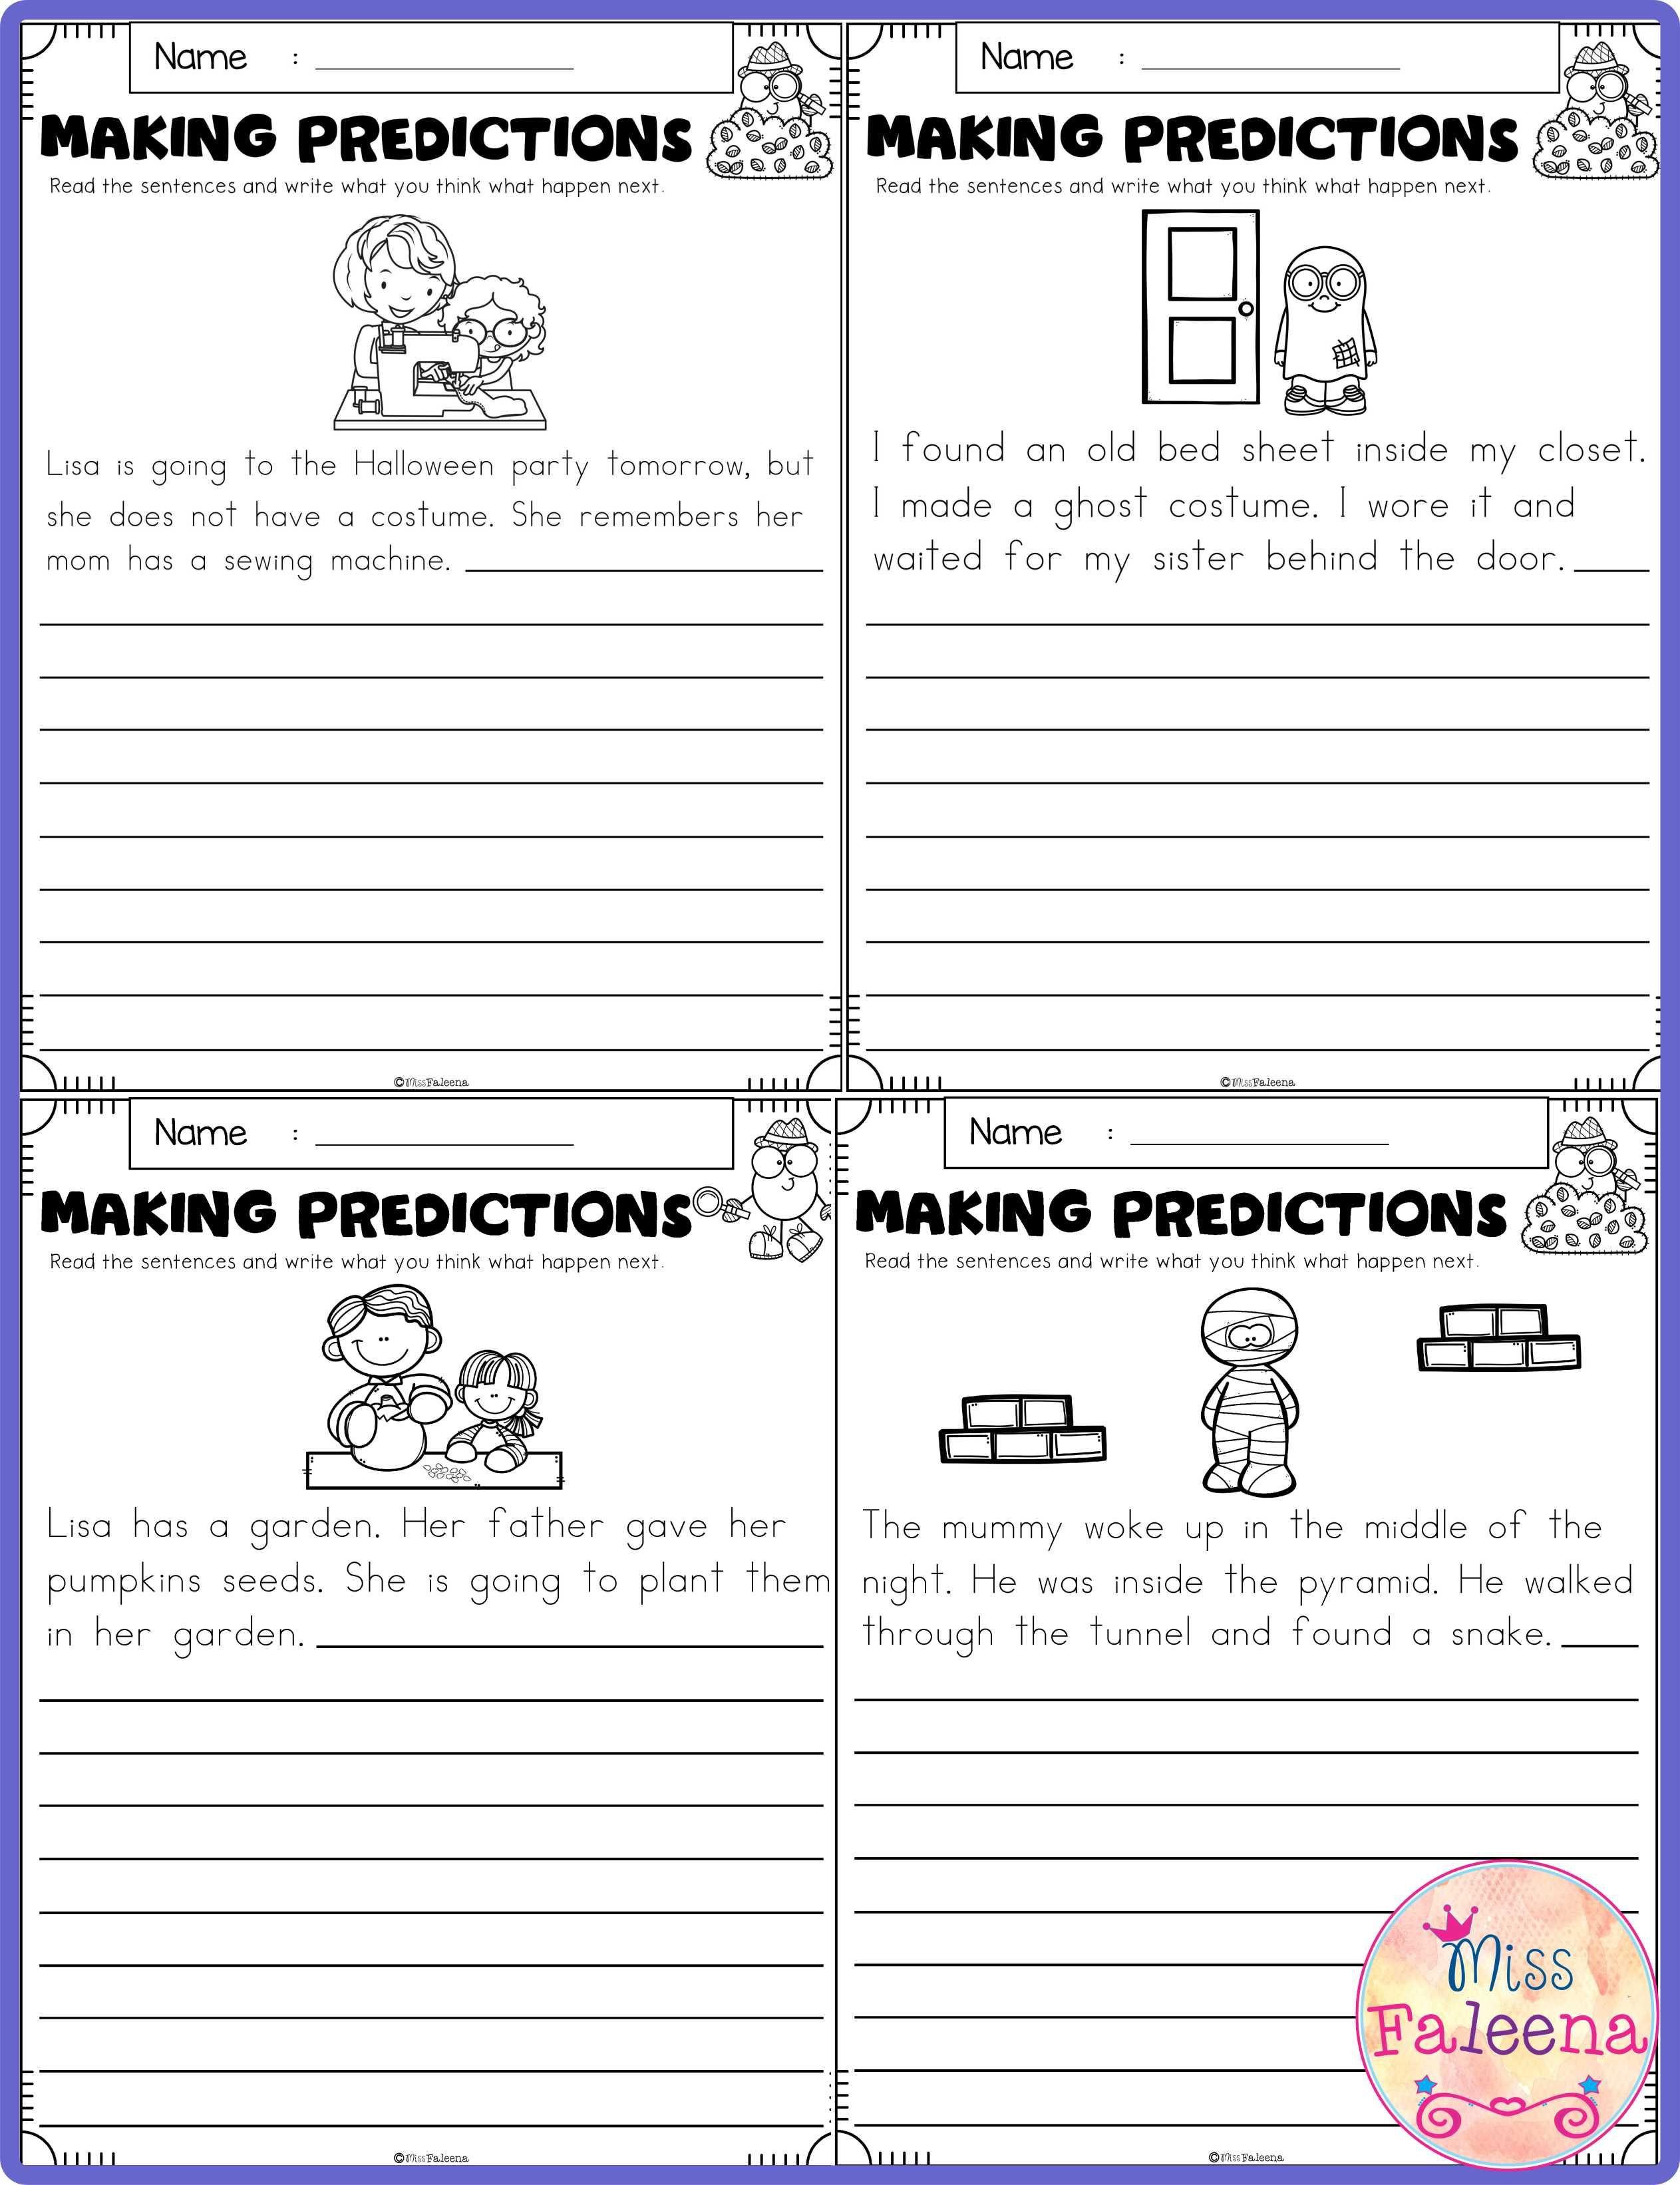 Predictions Worksheets 3rd Grade October Making Predictions